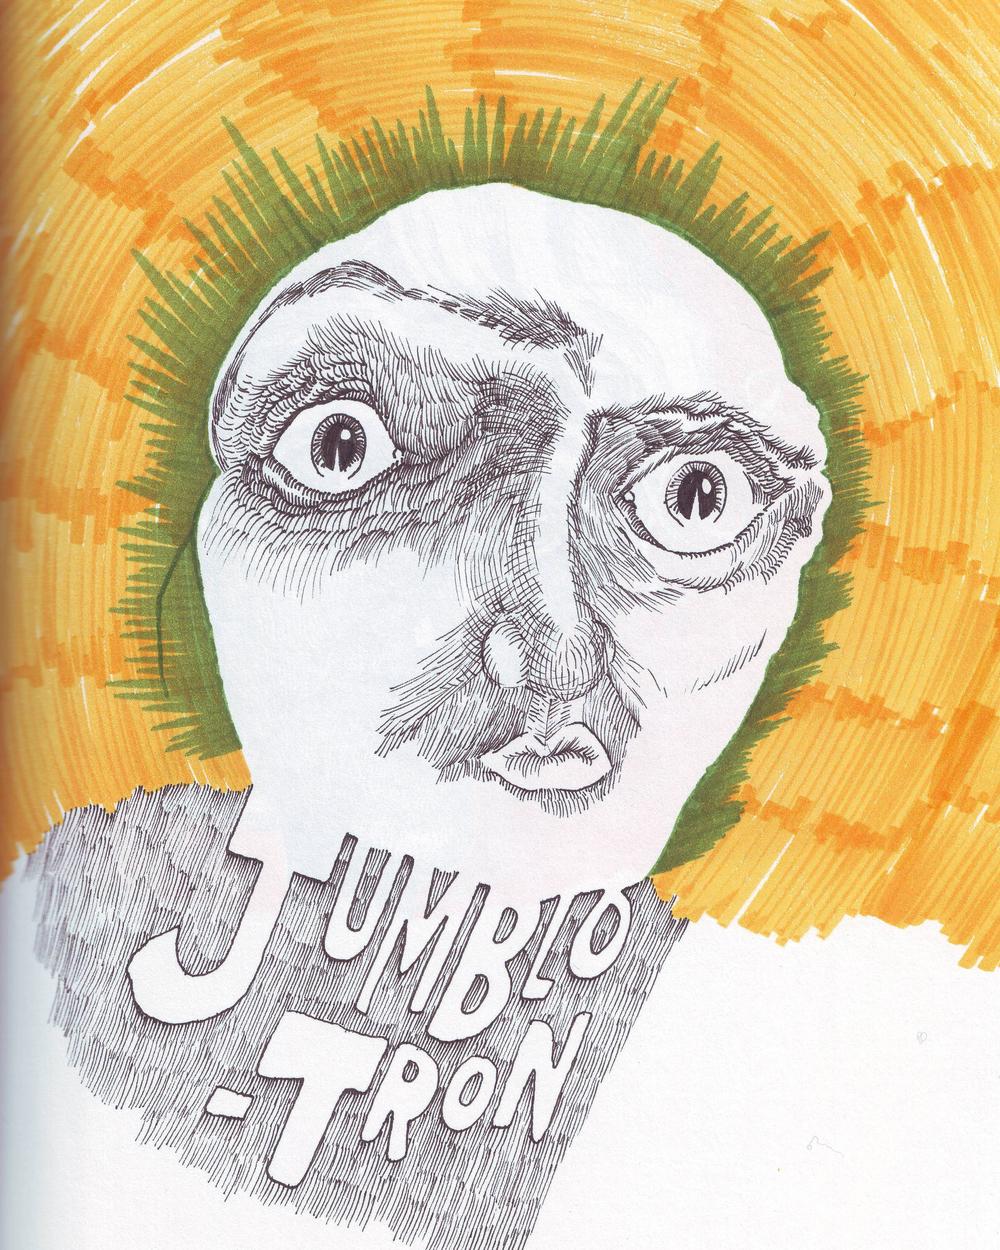 Jumblotron.